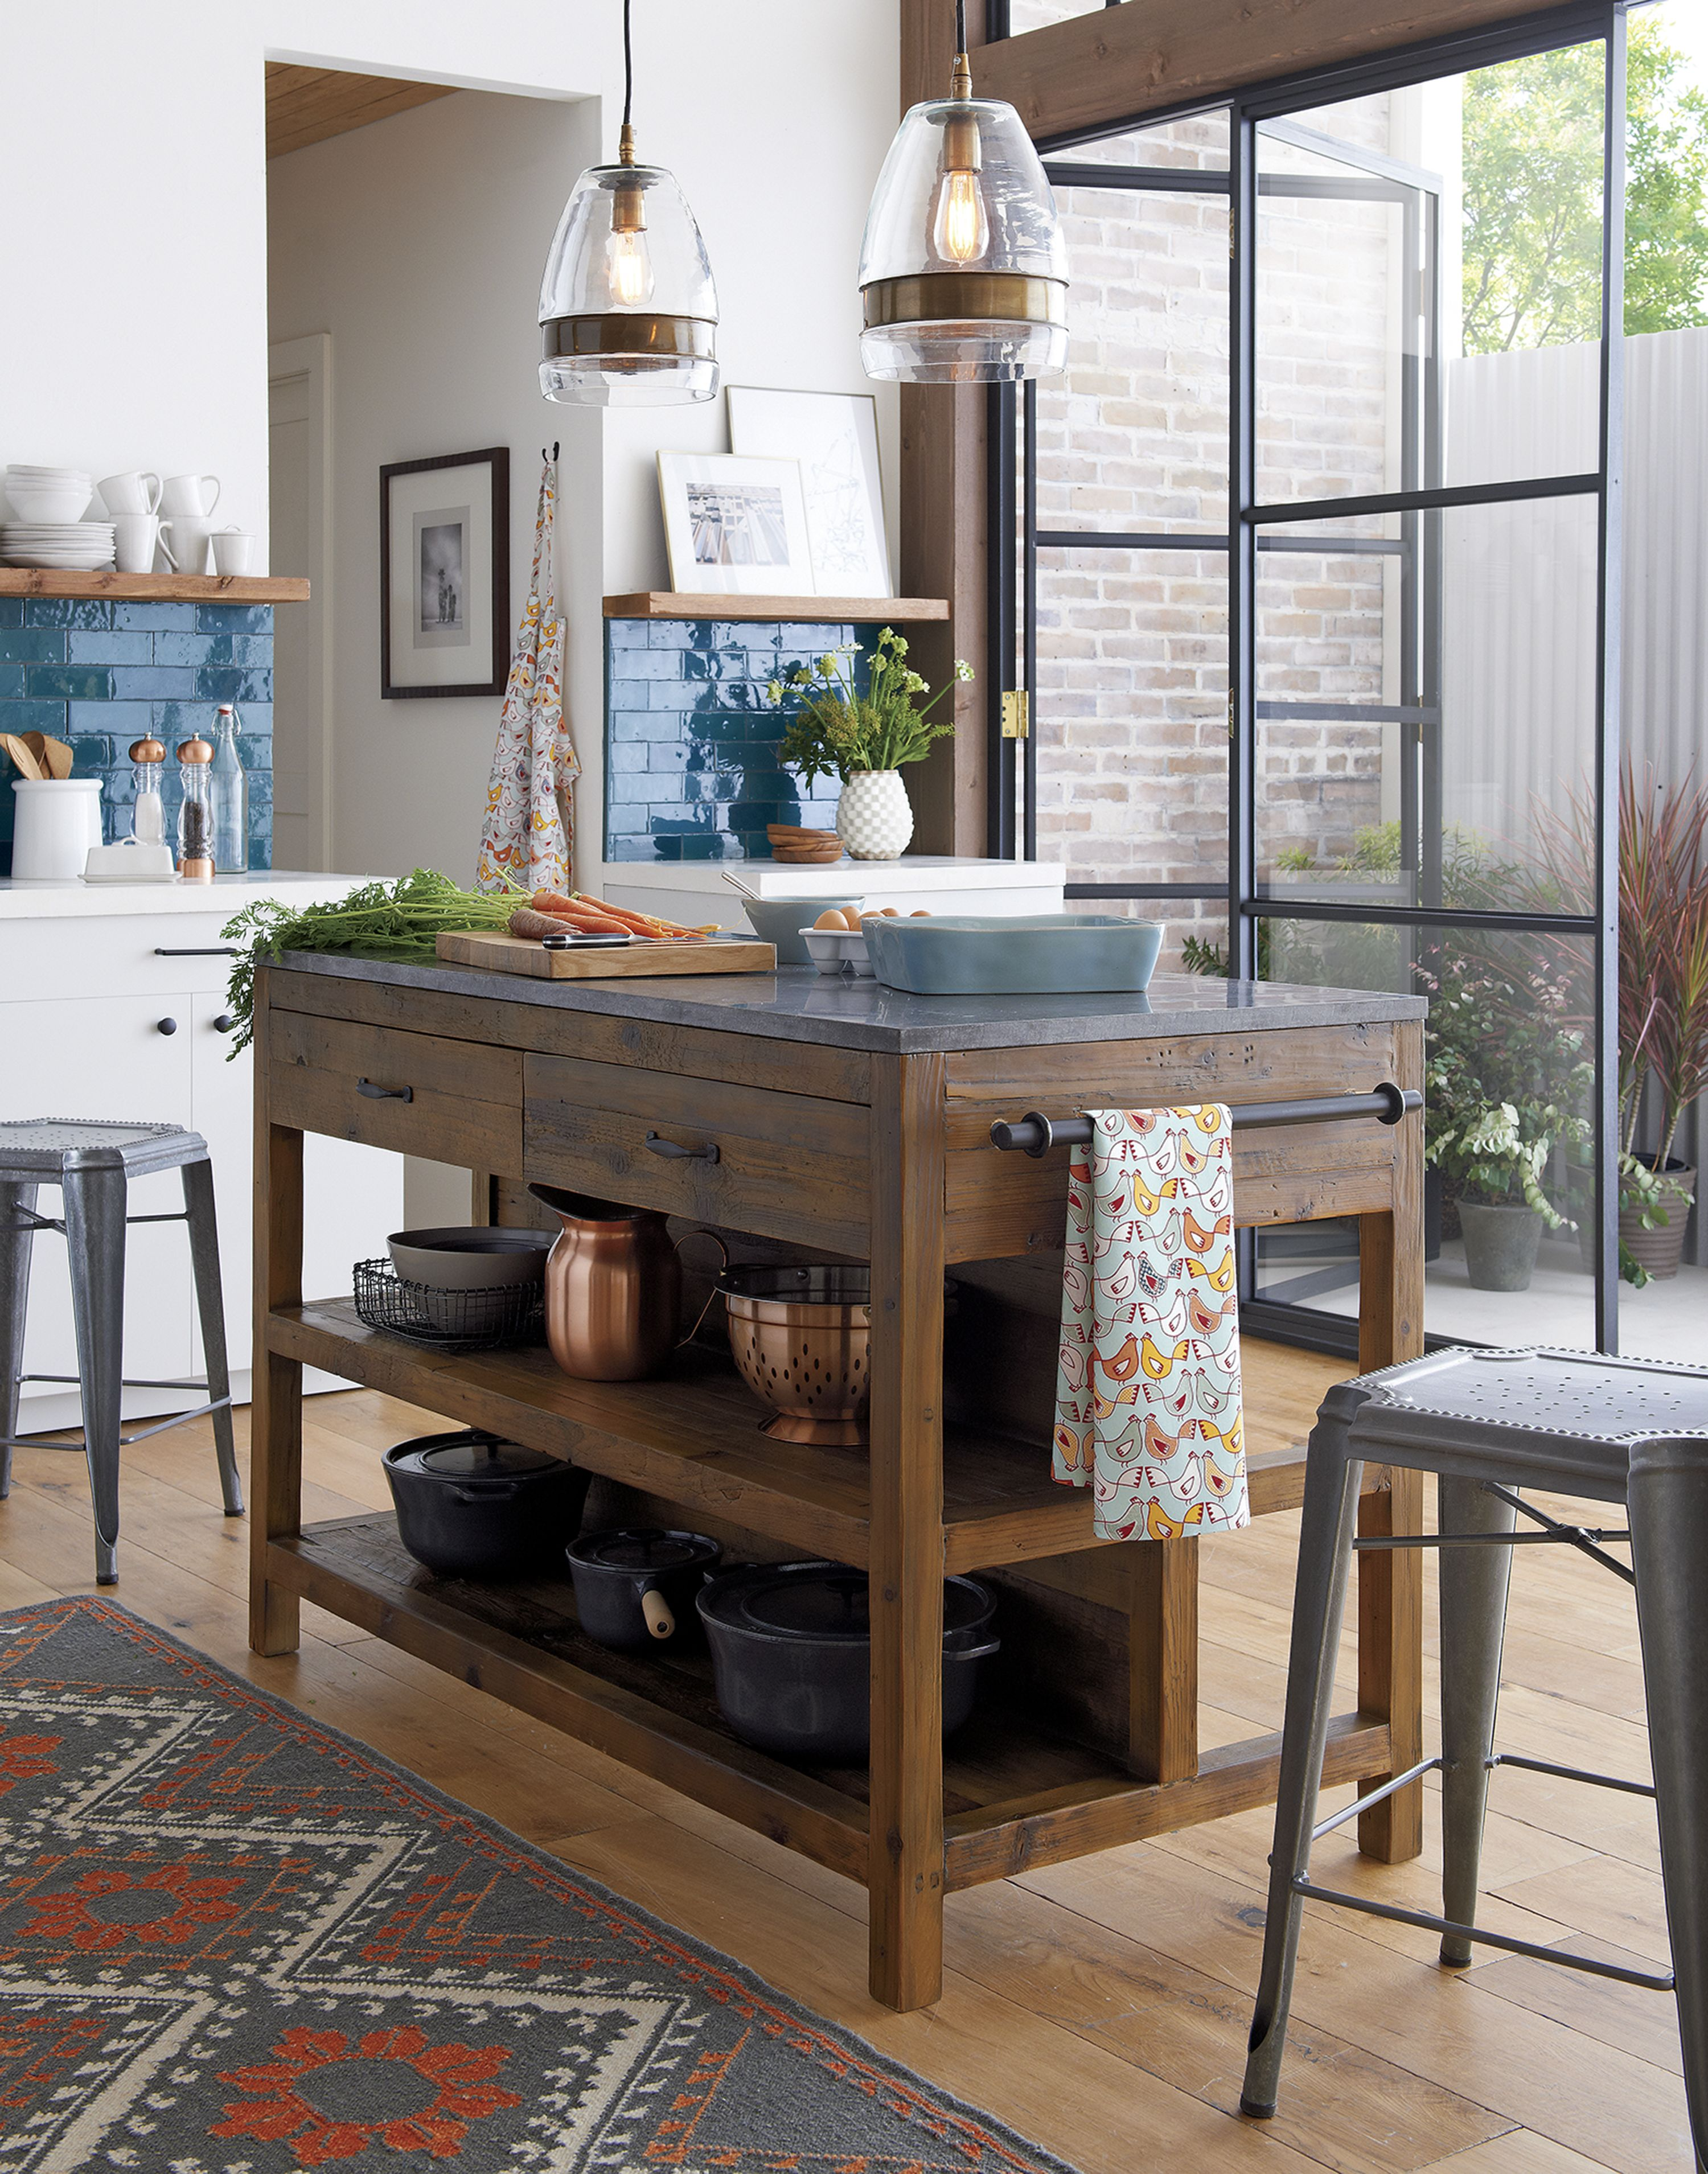 like a treasured vintage find or a custom designed piece this elegant kitchen island elegant on kitchen ideas with island id=60398